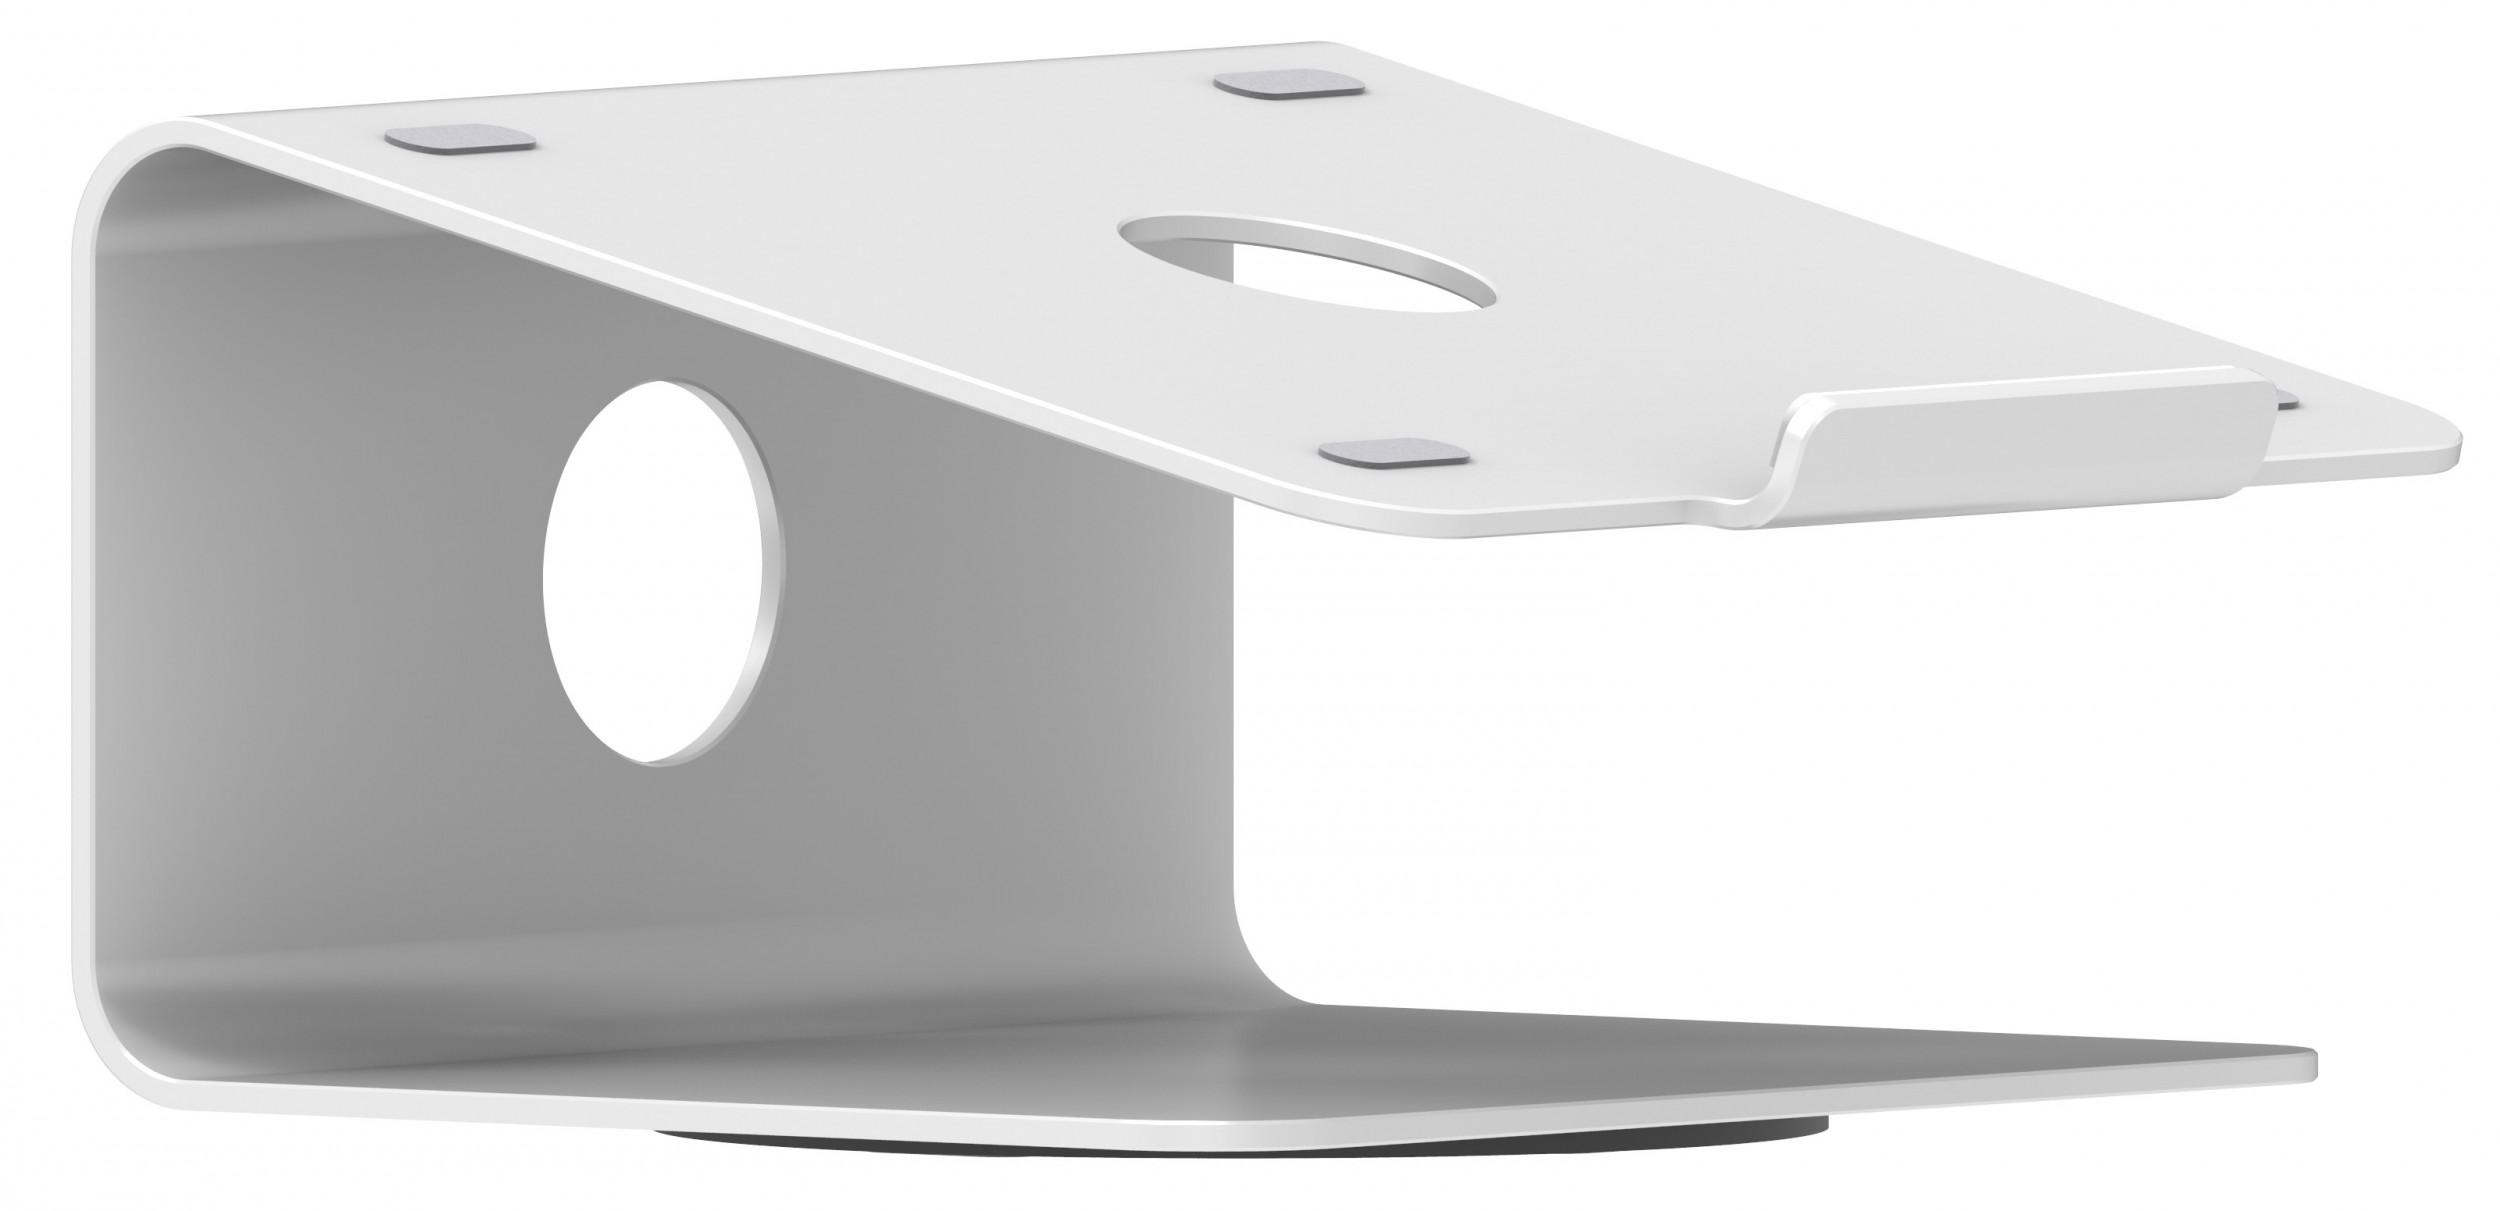 laptop st nder auch f r macbook 360 drehbar mts 02 11266. Black Bedroom Furniture Sets. Home Design Ideas